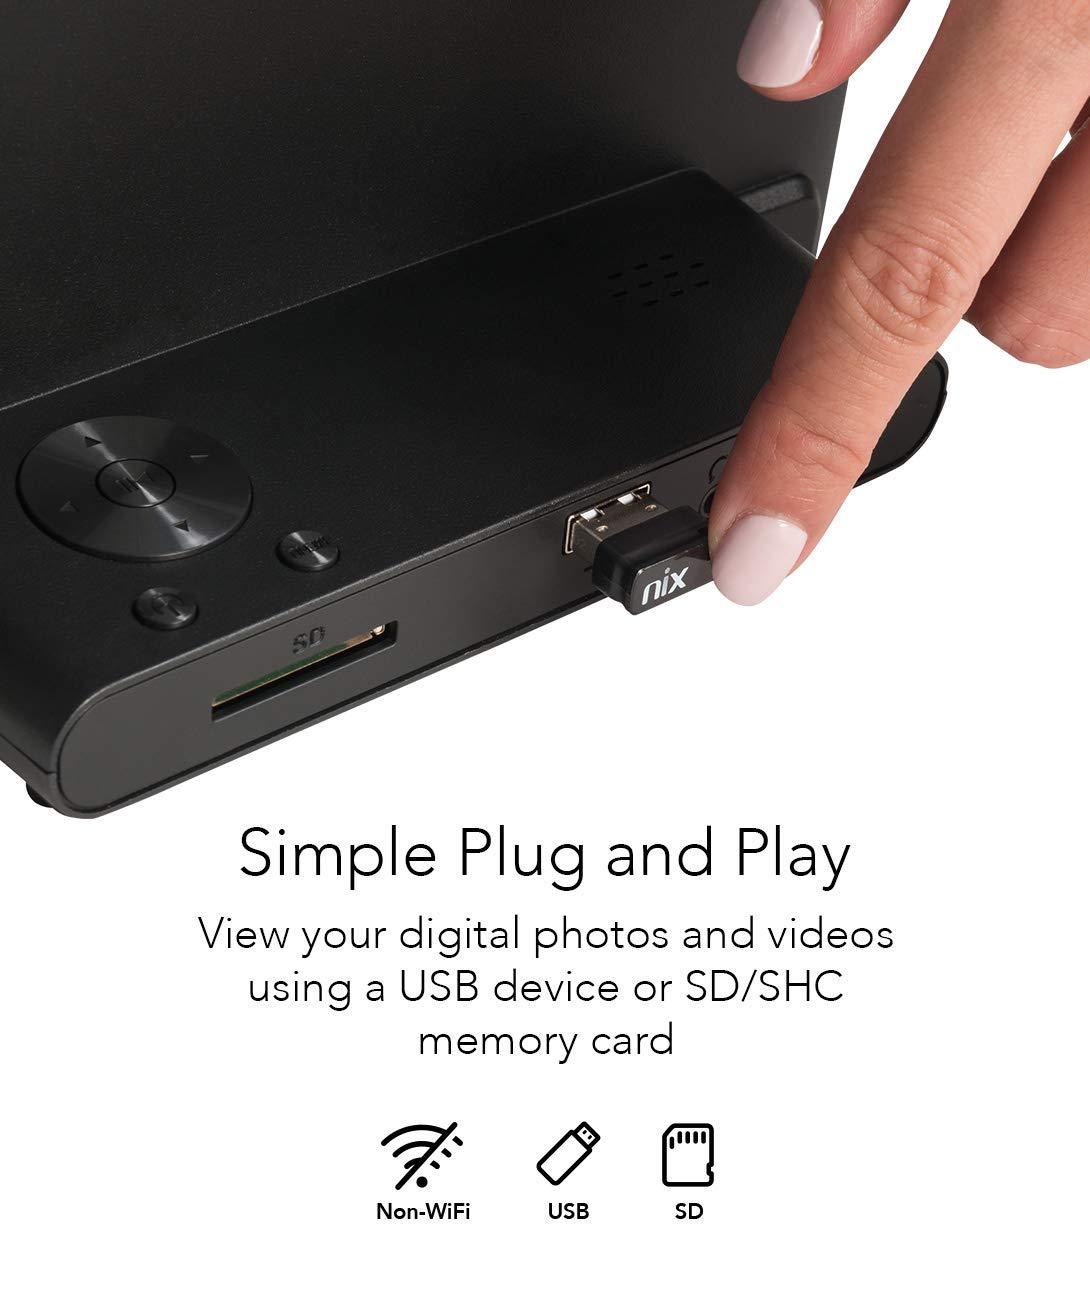 Amazon.com: NIX Advanced igital Photo & HD Video Frame, with ...